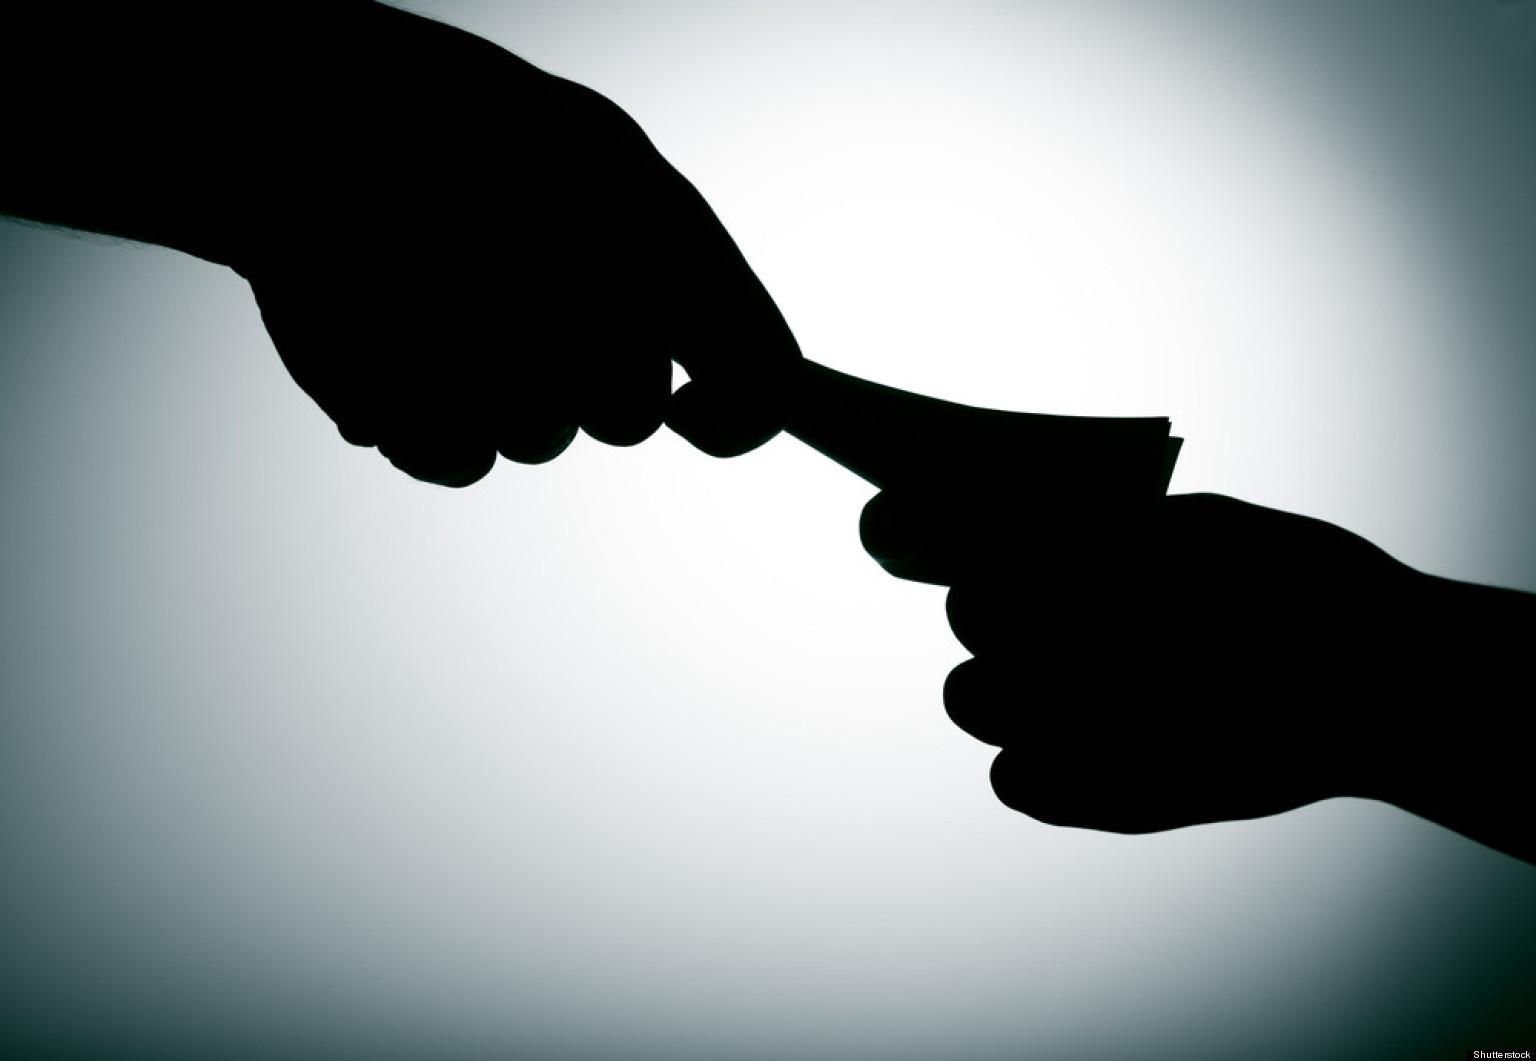 whistleblowing about corruption